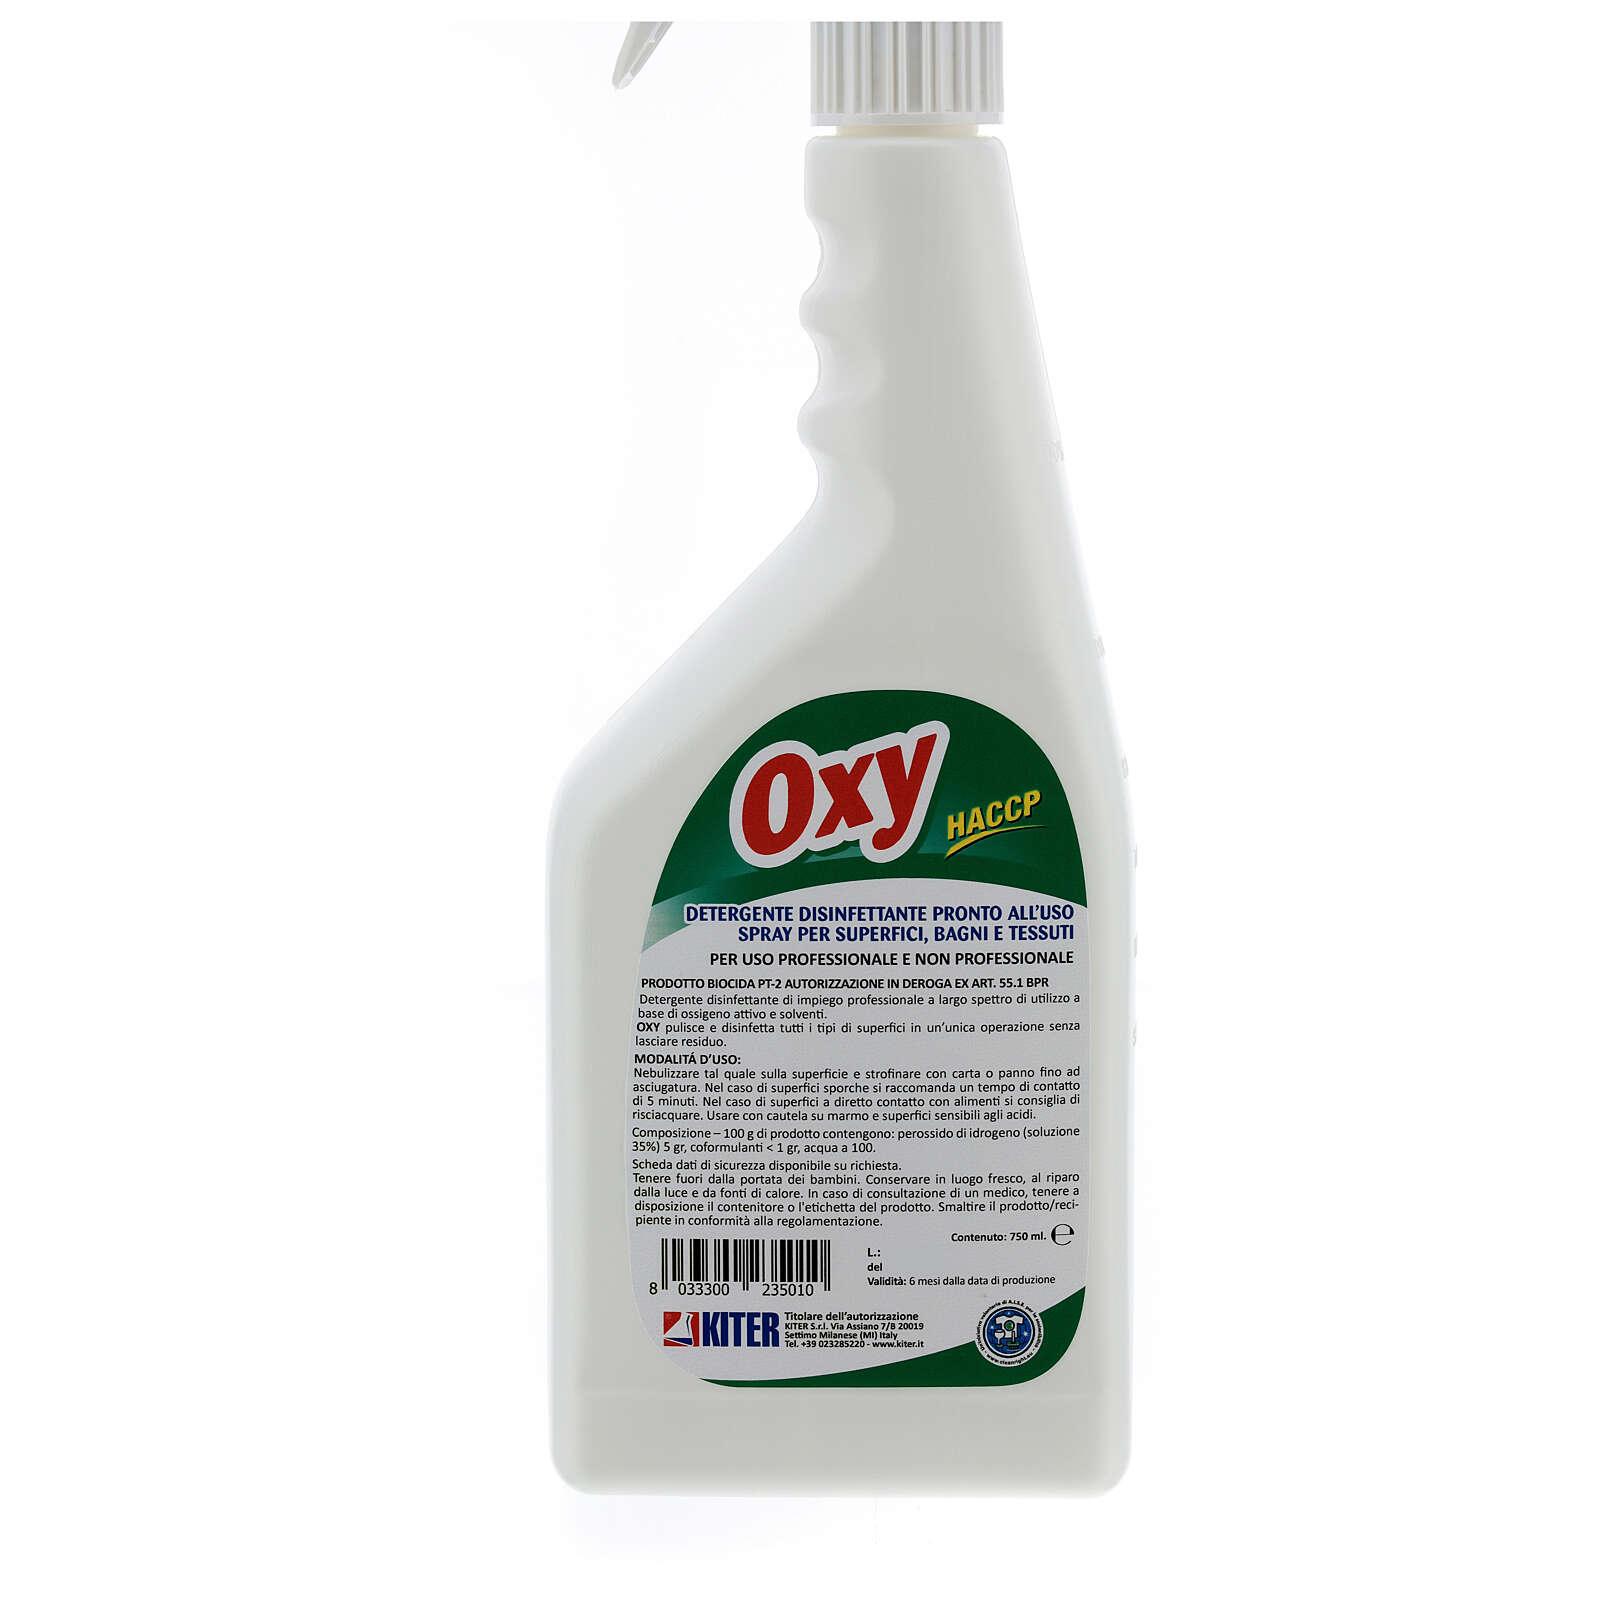 Désinfectant Oxy Biocida spray 750 ml 3